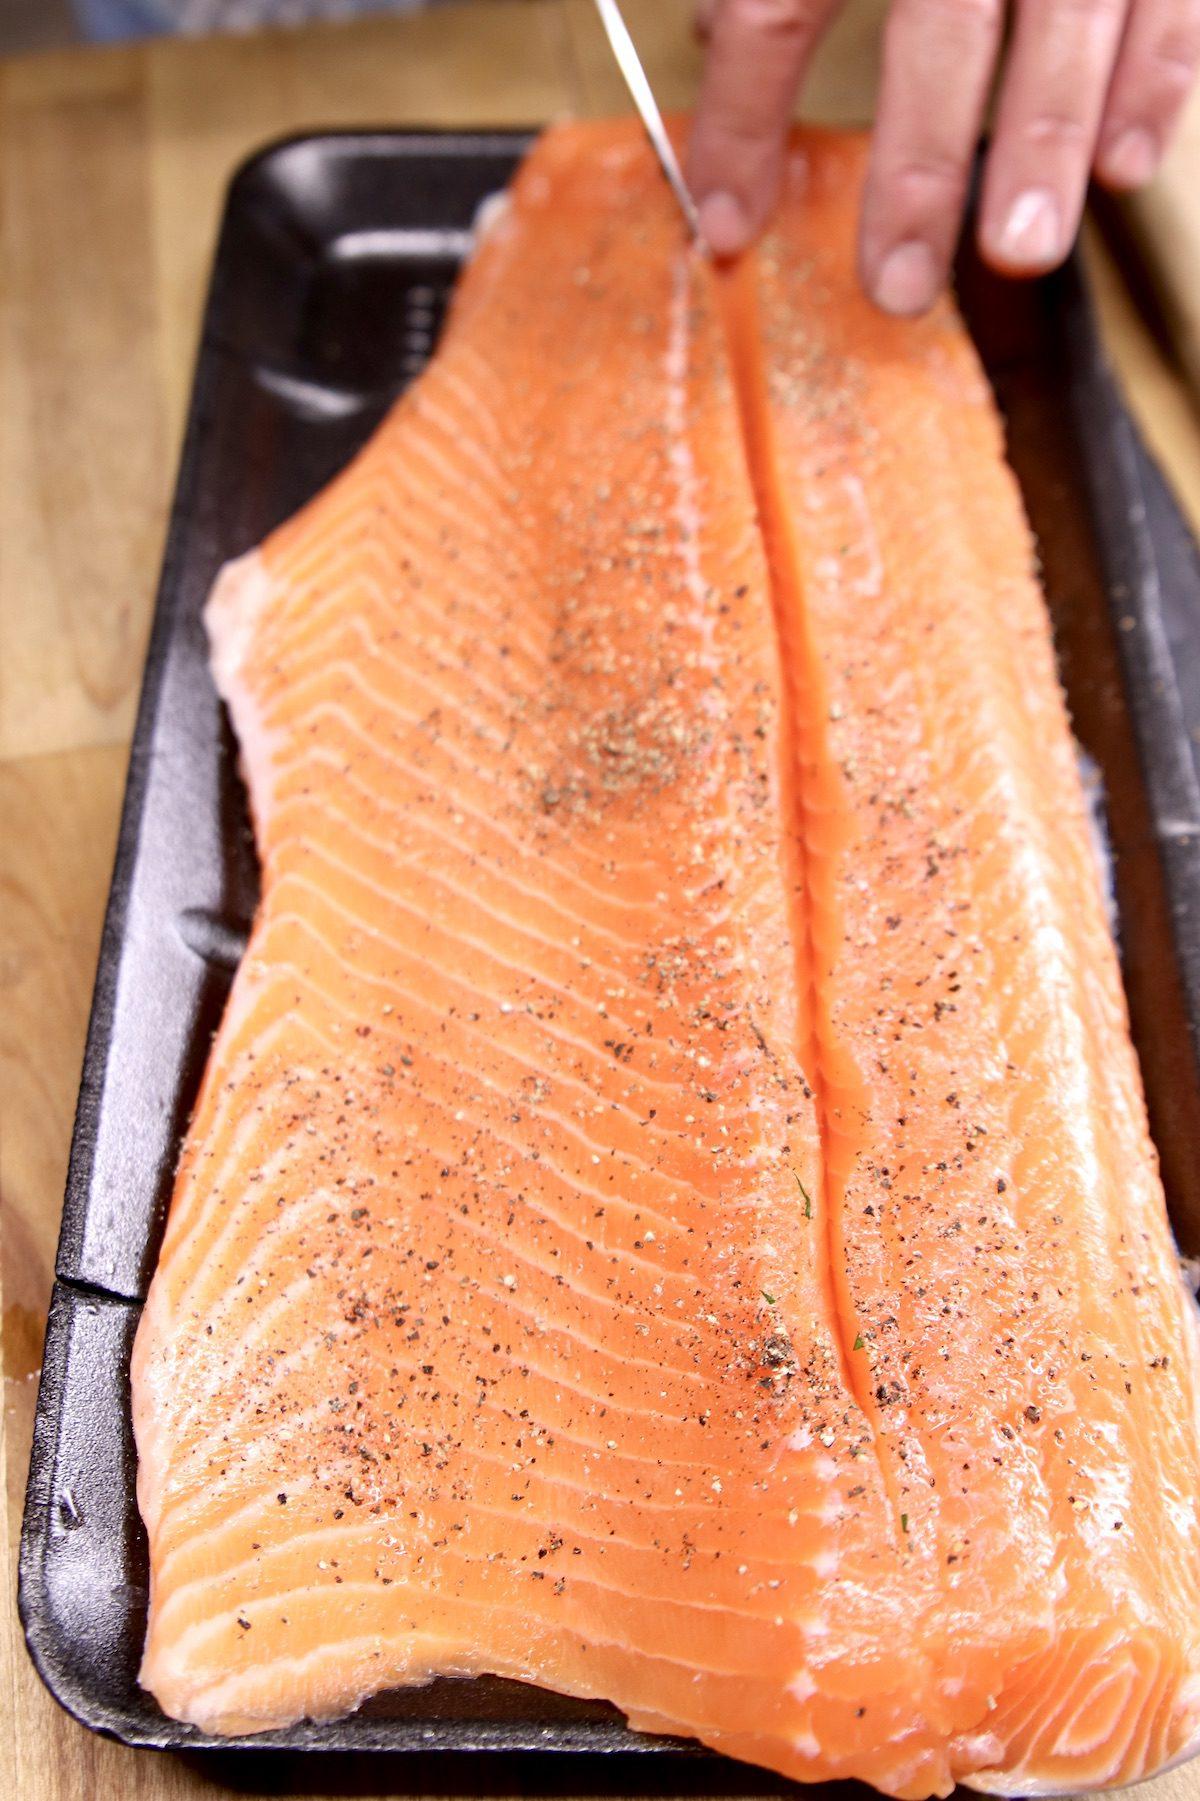 Slicing salmon lengthwise